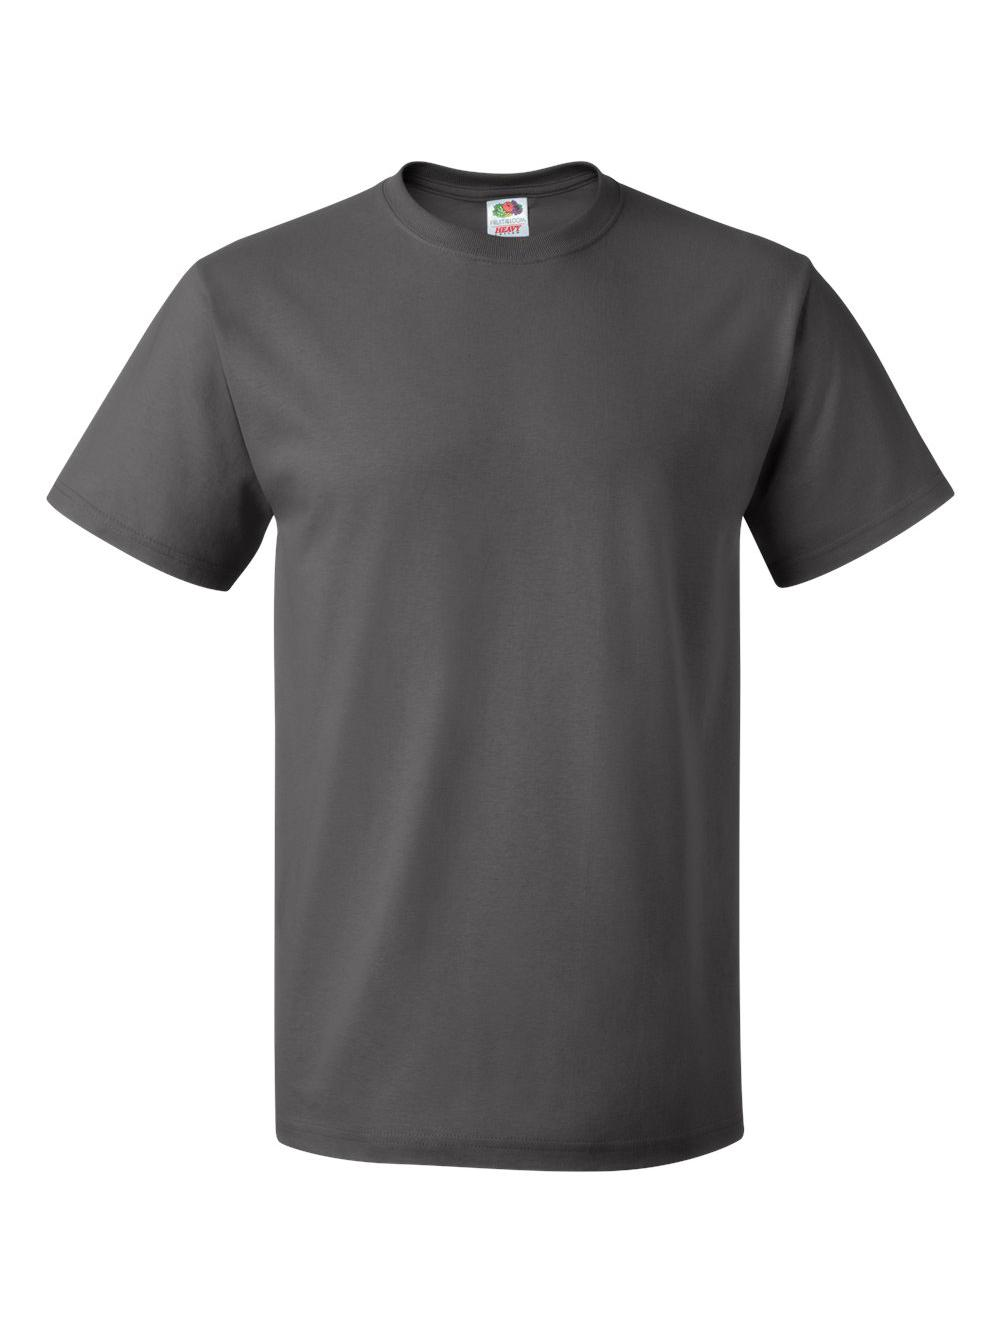 Fruit-of-the-Loom-HD-Cotton-Short-Sleeve-T-Shirt-3930R thumbnail 24